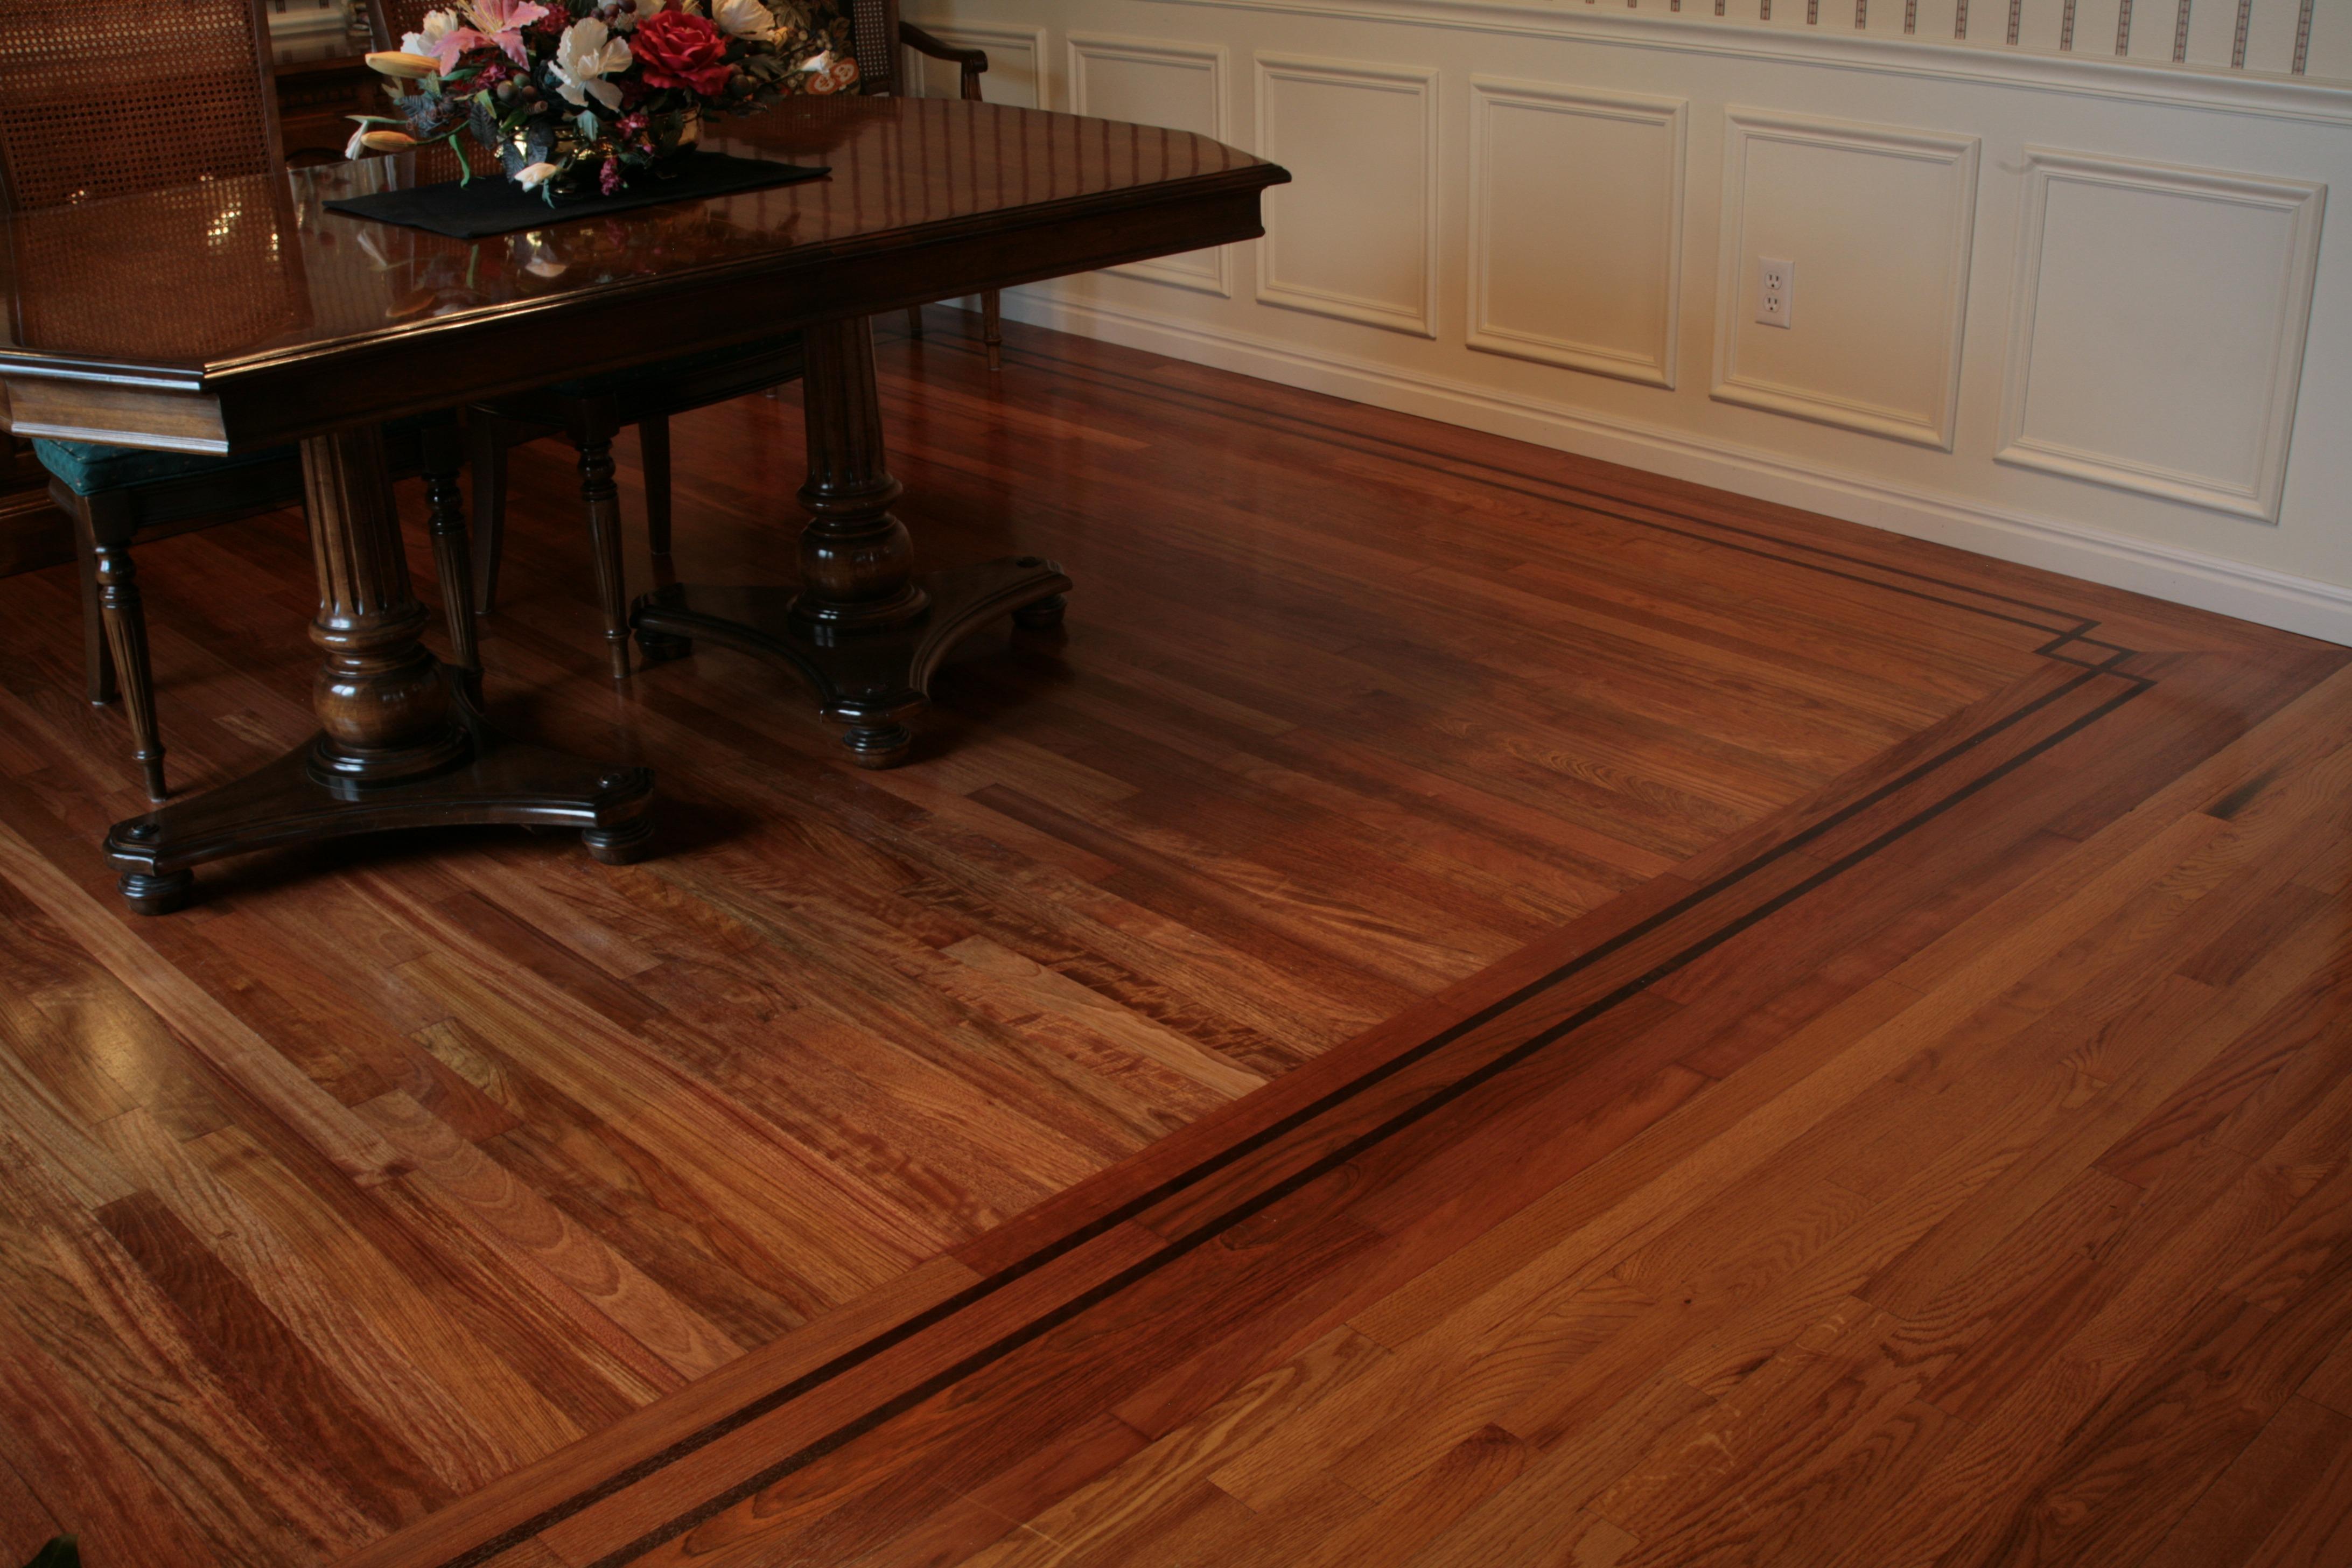 Lambert Hardwood Flooring image 2